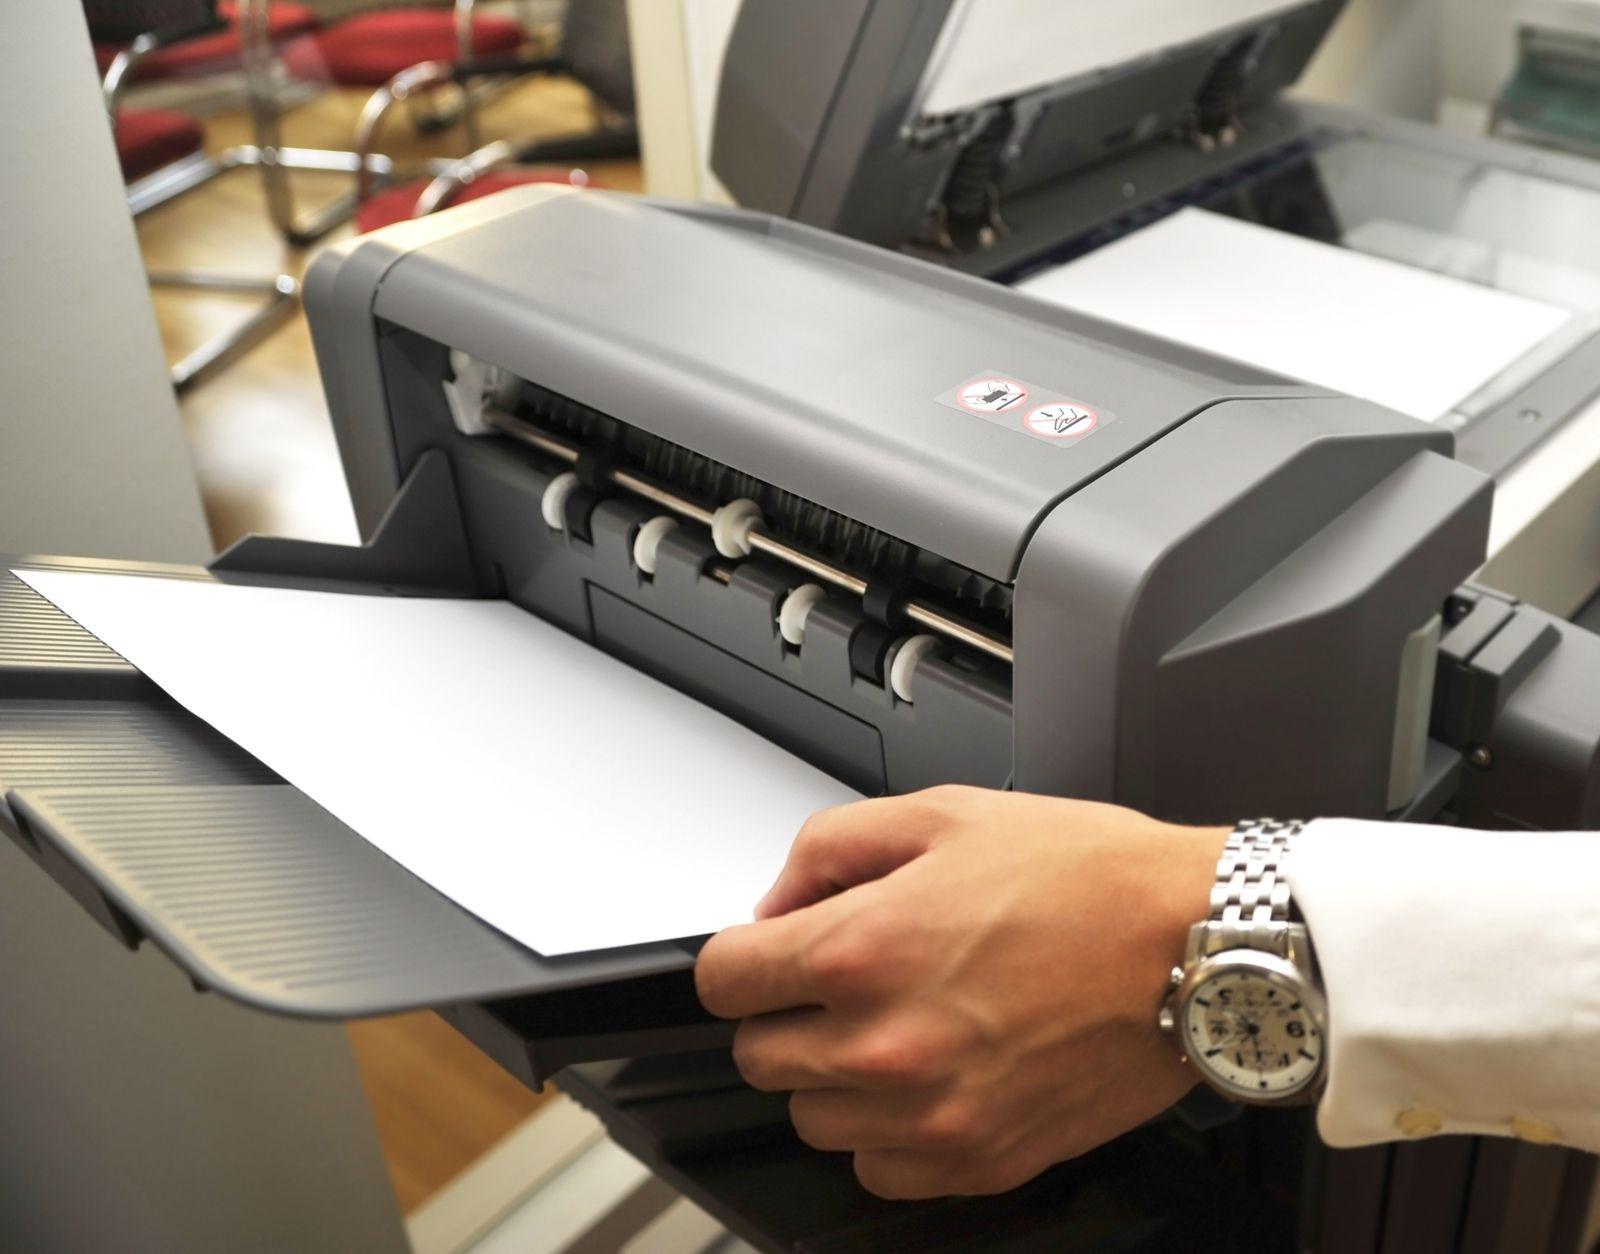 Disinfect Multifunction Printers